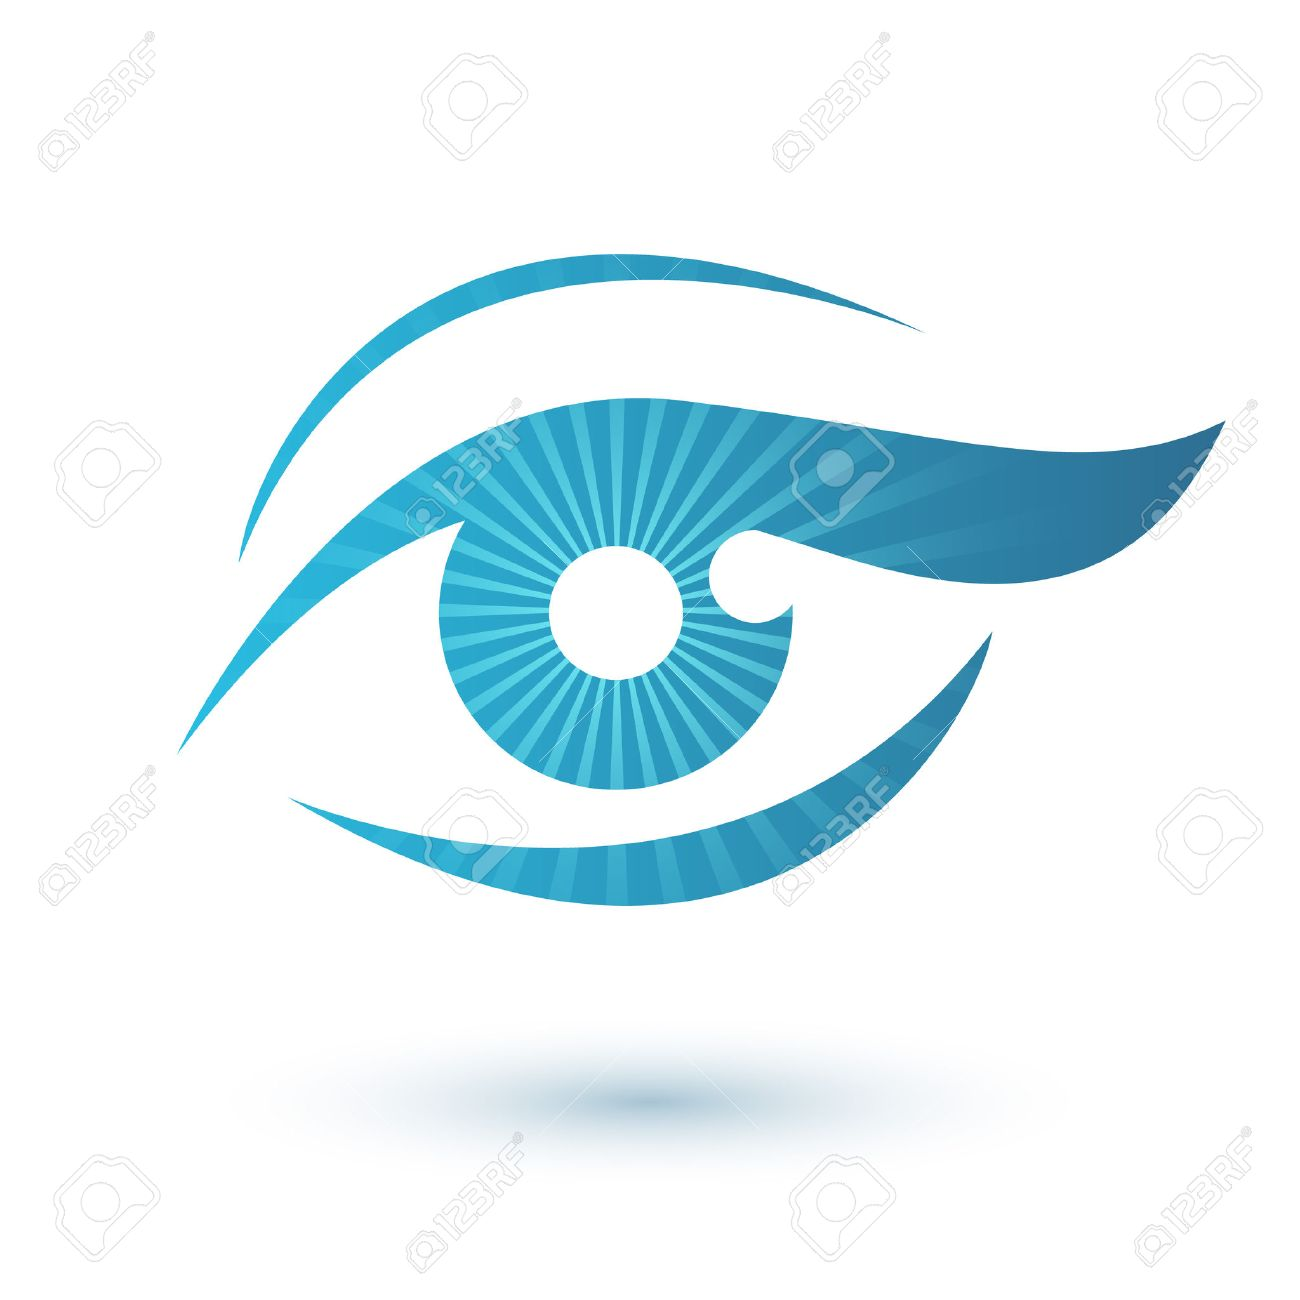 Woman eye icon beauty symbol. Vision icon. - 38194184